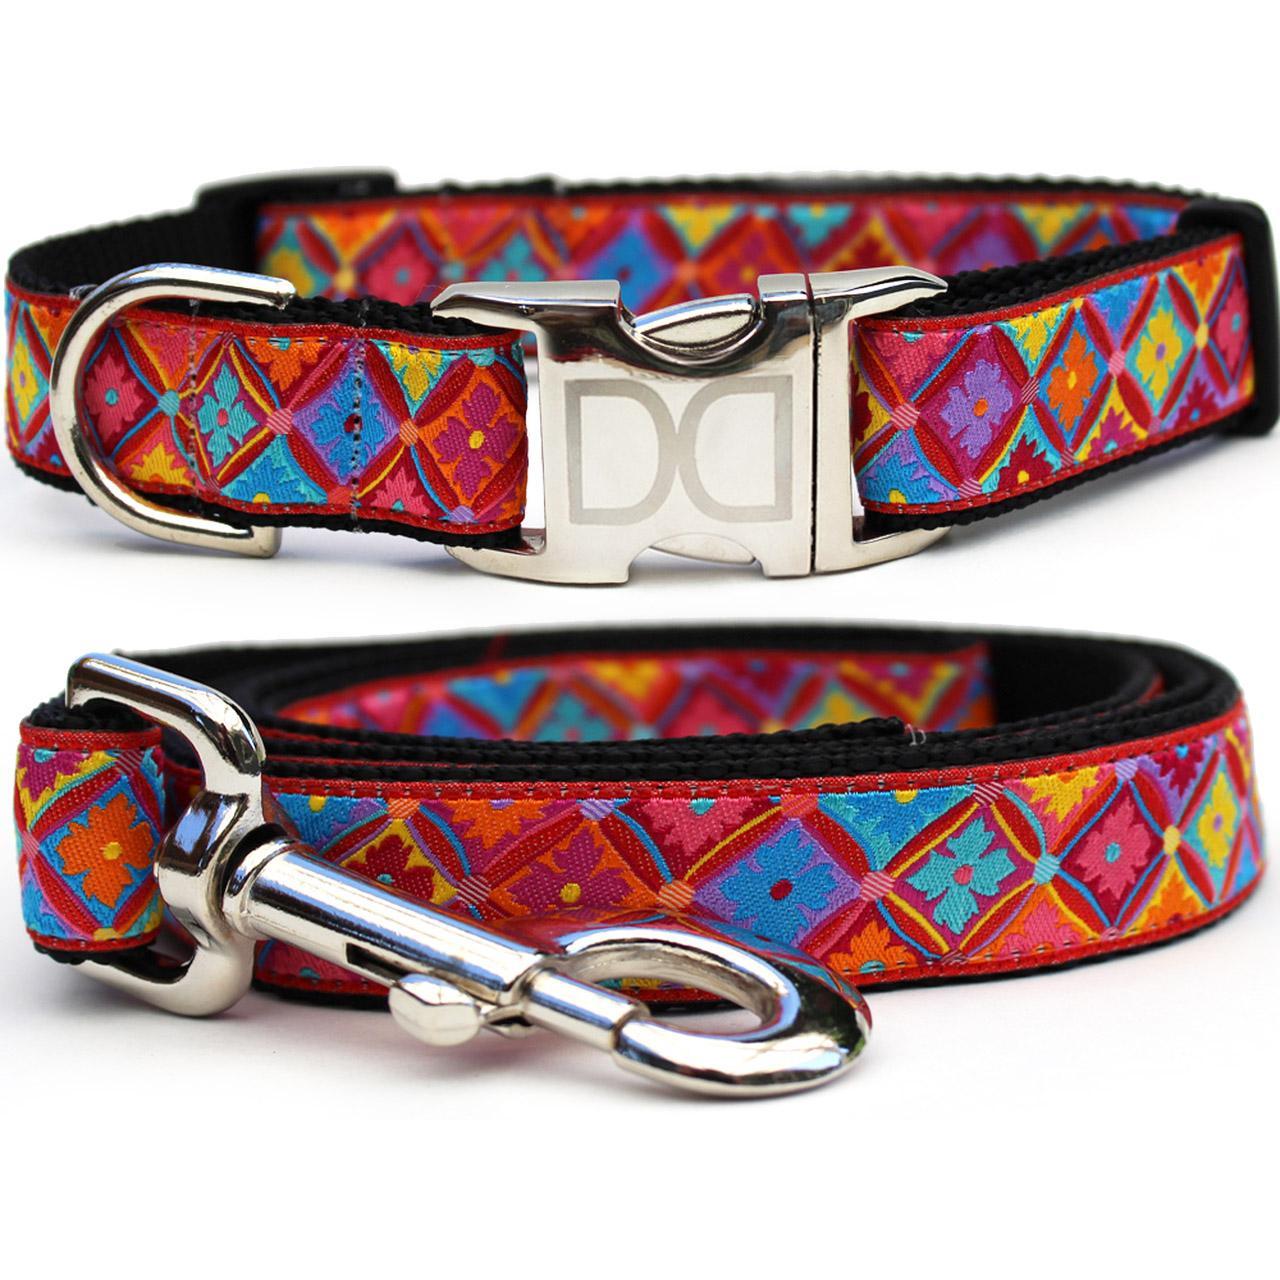 Bali Breeze Dog Collar and Leash Set by Diva Dog